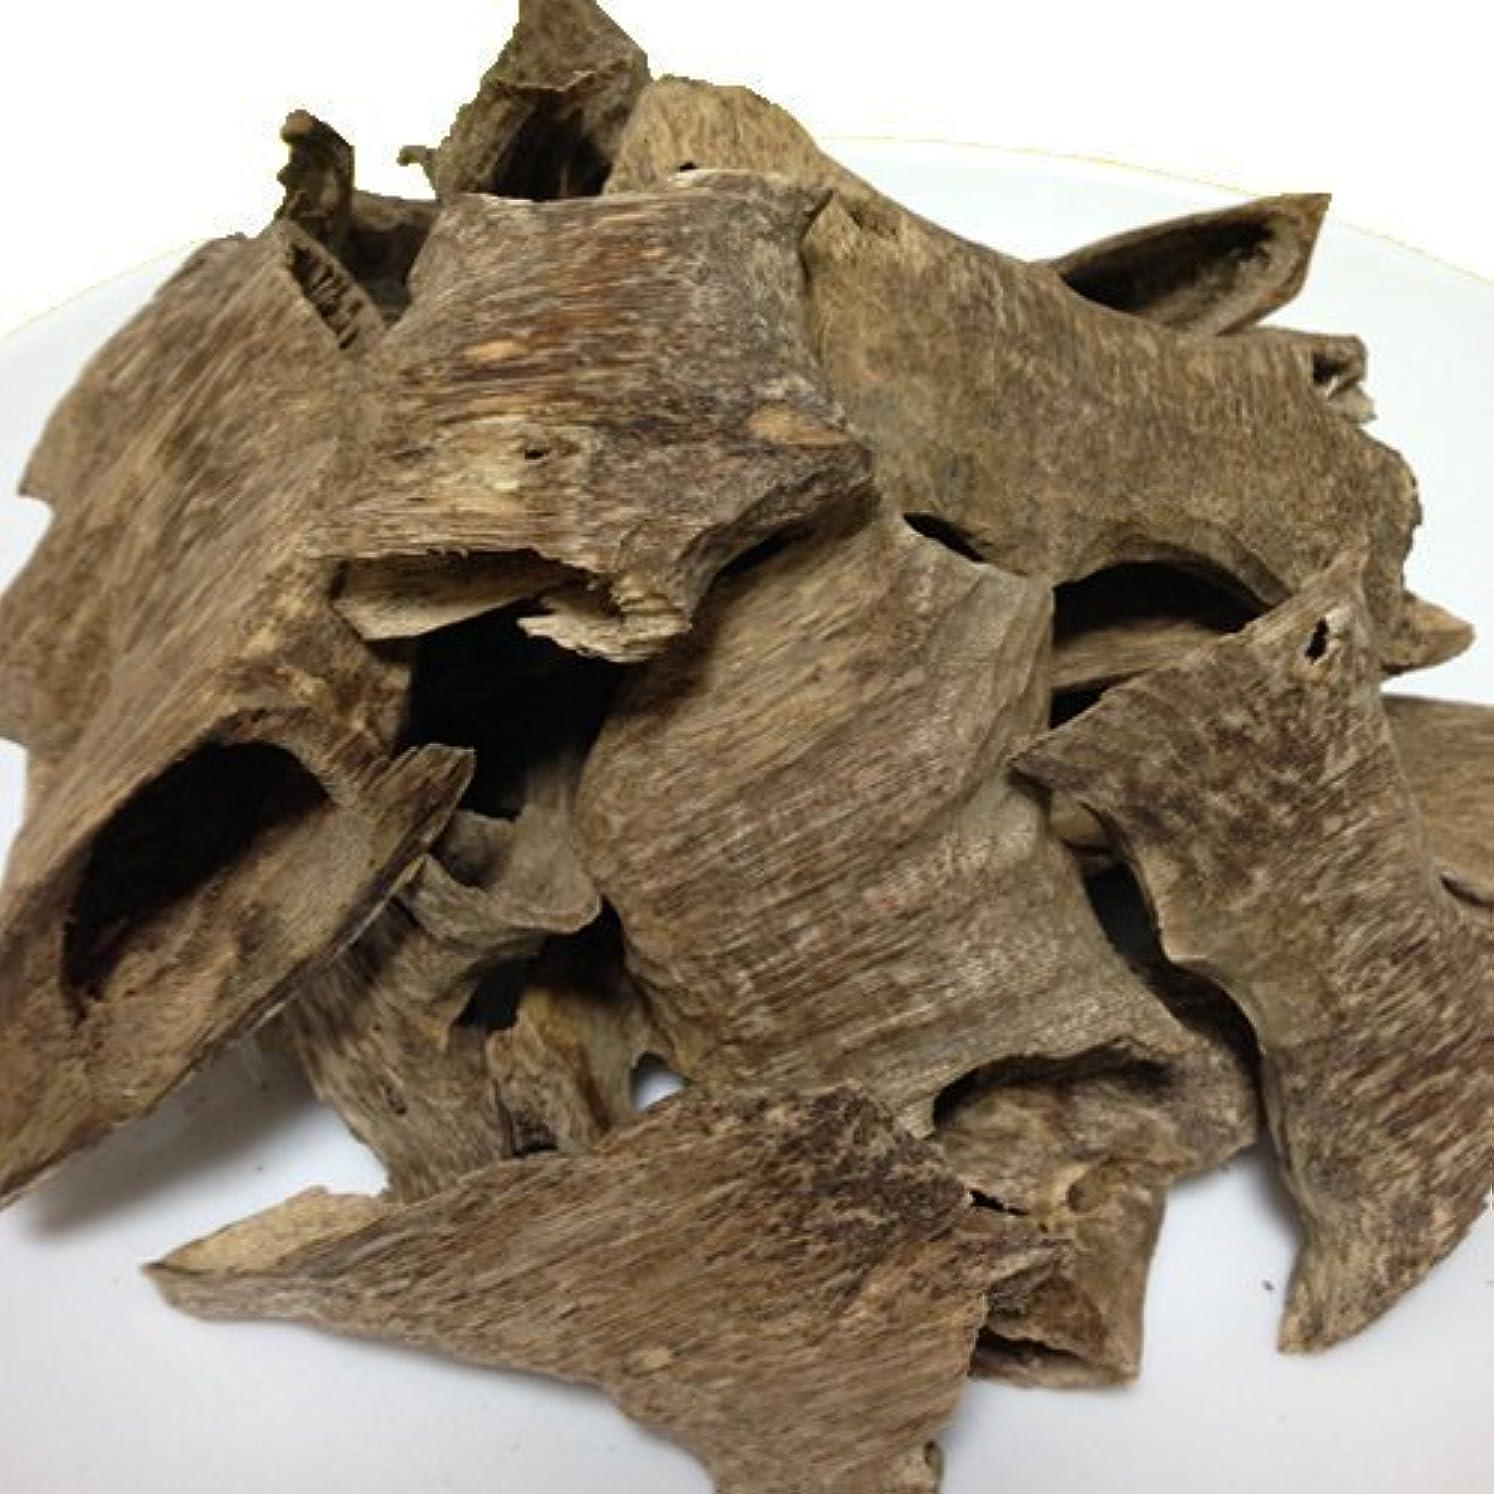 [ Vietnam market ] Agarwood Chips (Aloeswood Agalloch Eaglewood) From Vietnam 3.5 Oz by Vietnam market [並行輸入品]